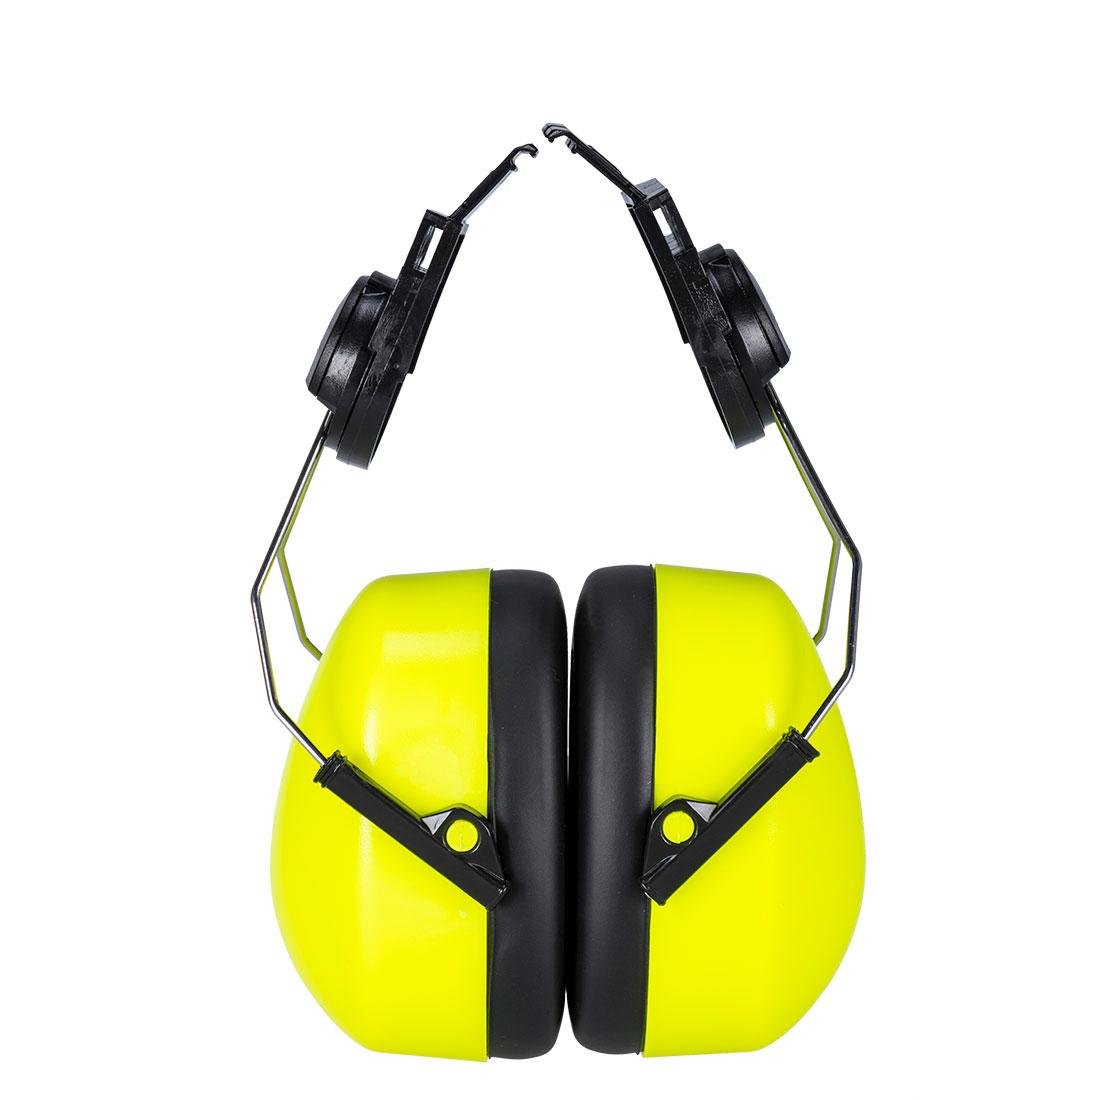 Portwest HV Clip-On Ear Protector